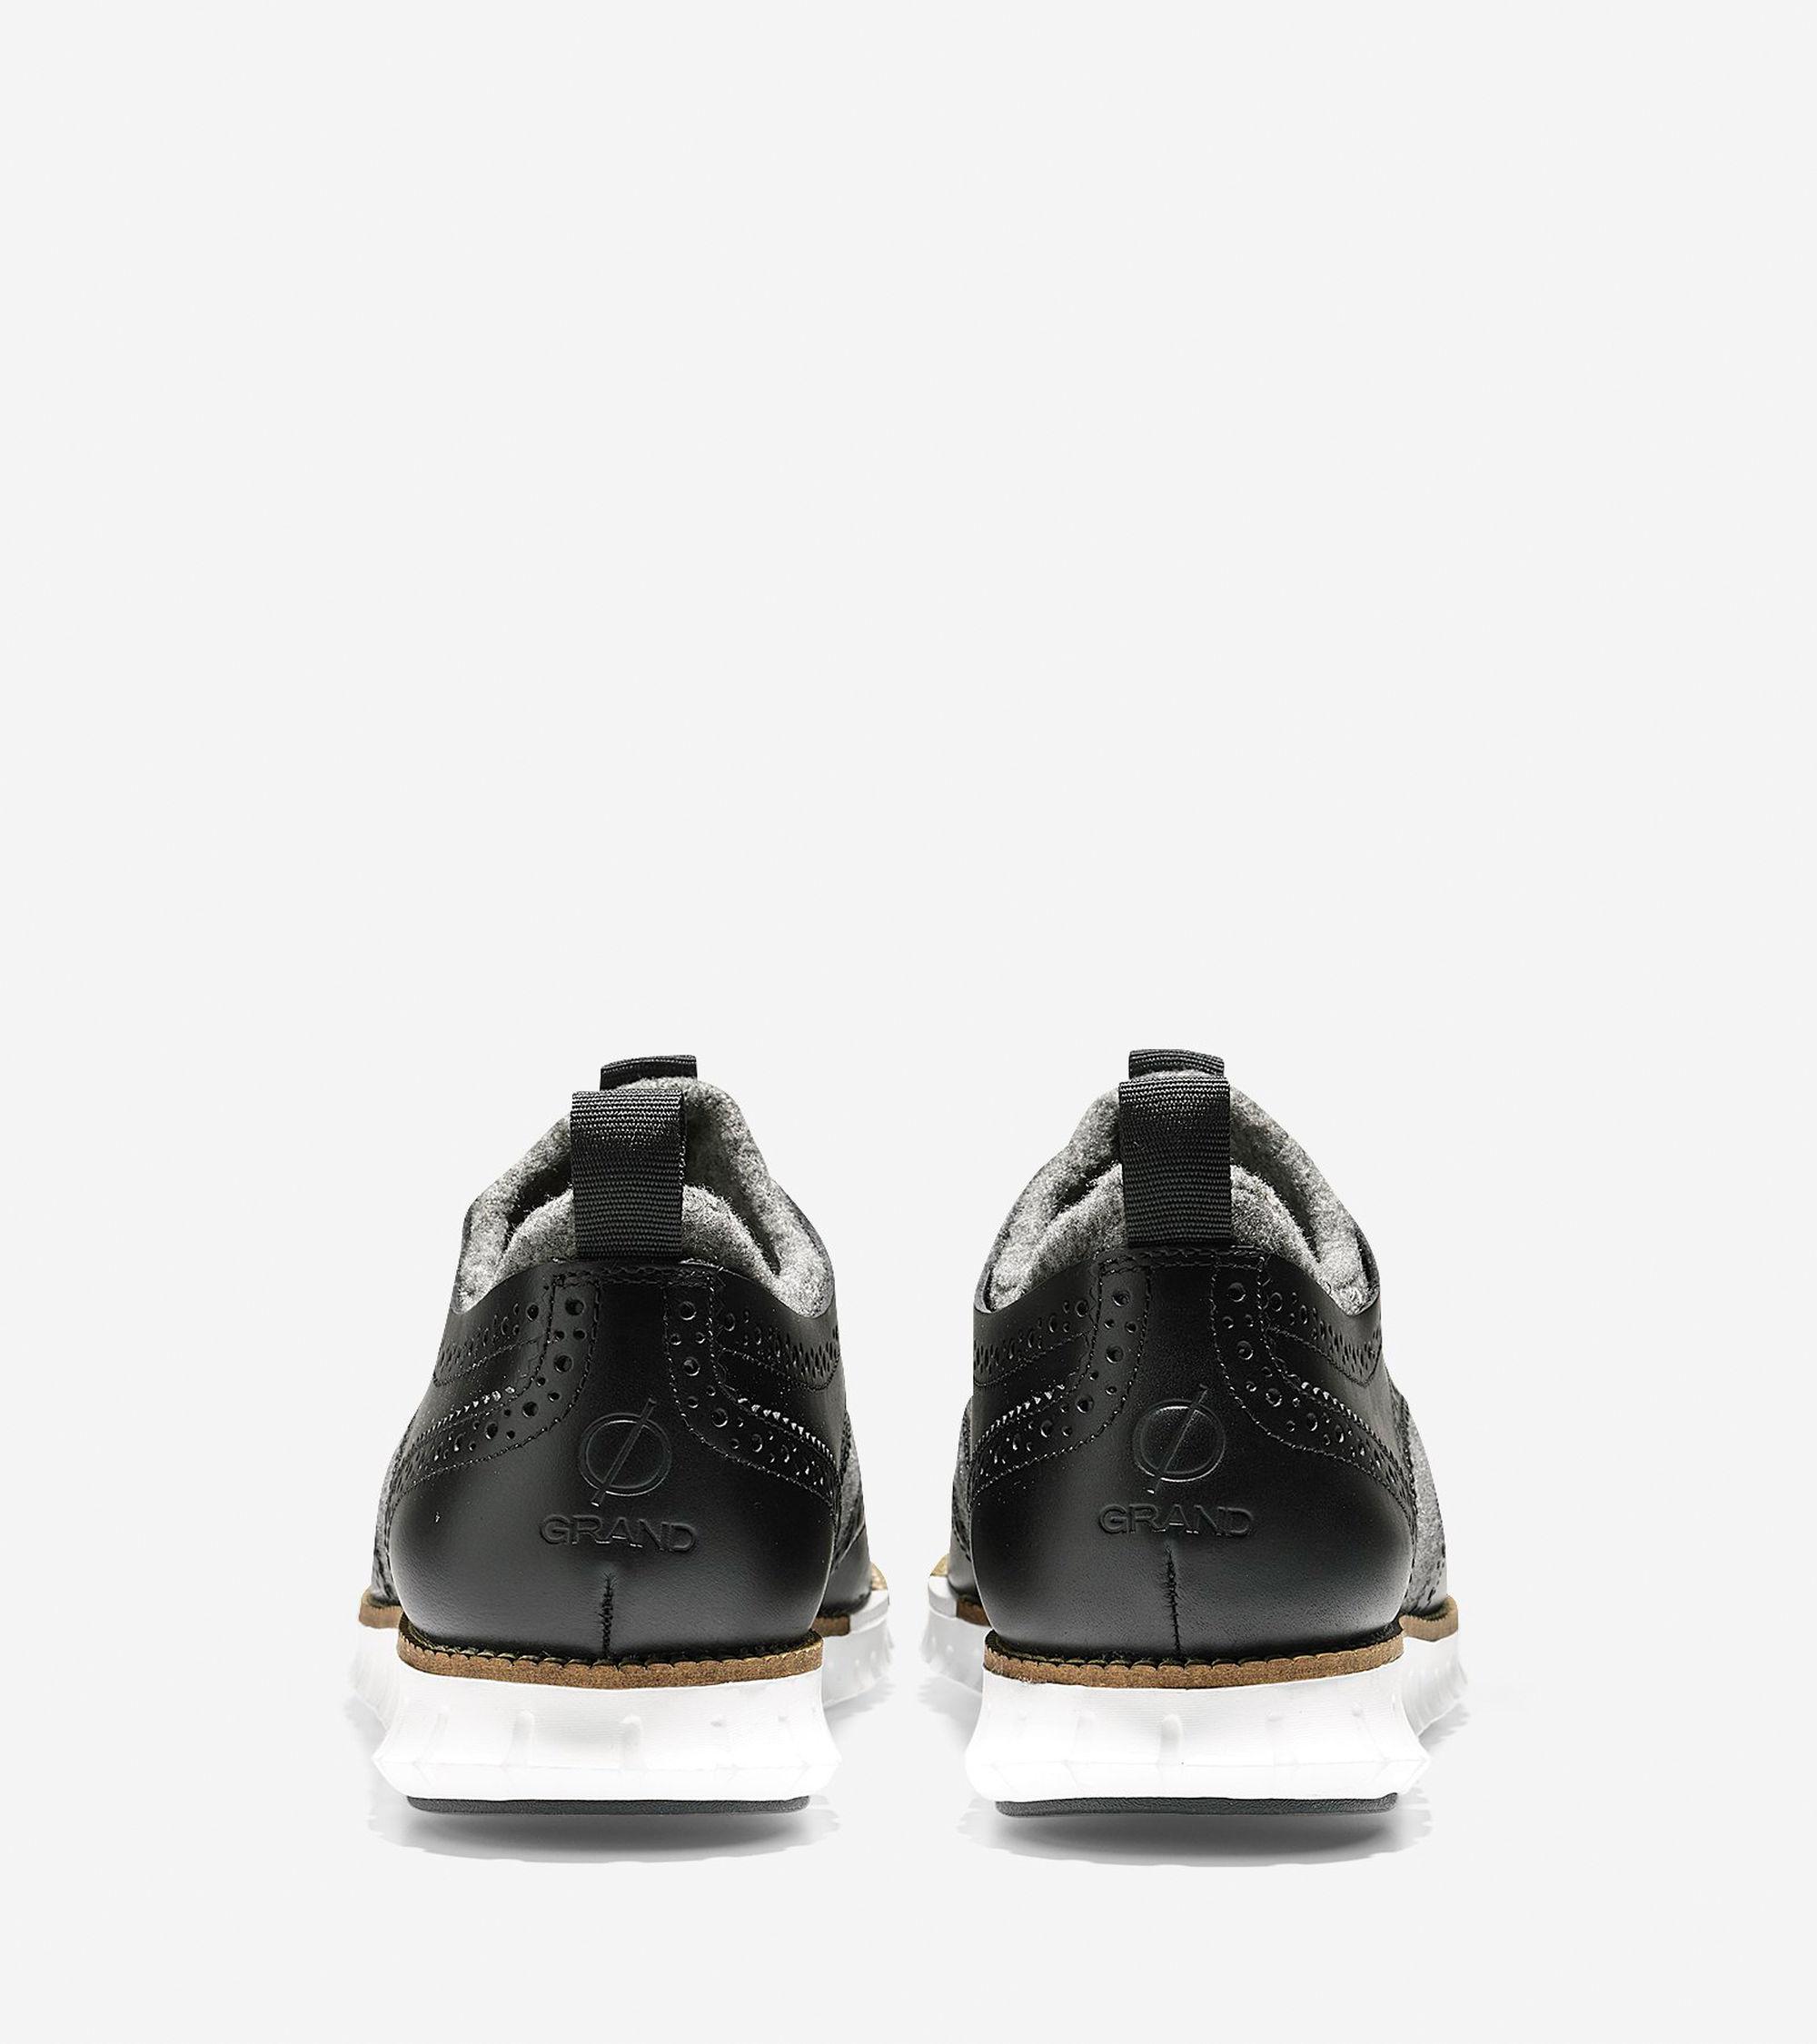 3b24434242e Lyst - Cole Haan Men s Zerøgrand Neoprene Lined Wingtip Oxford in Black for  Men